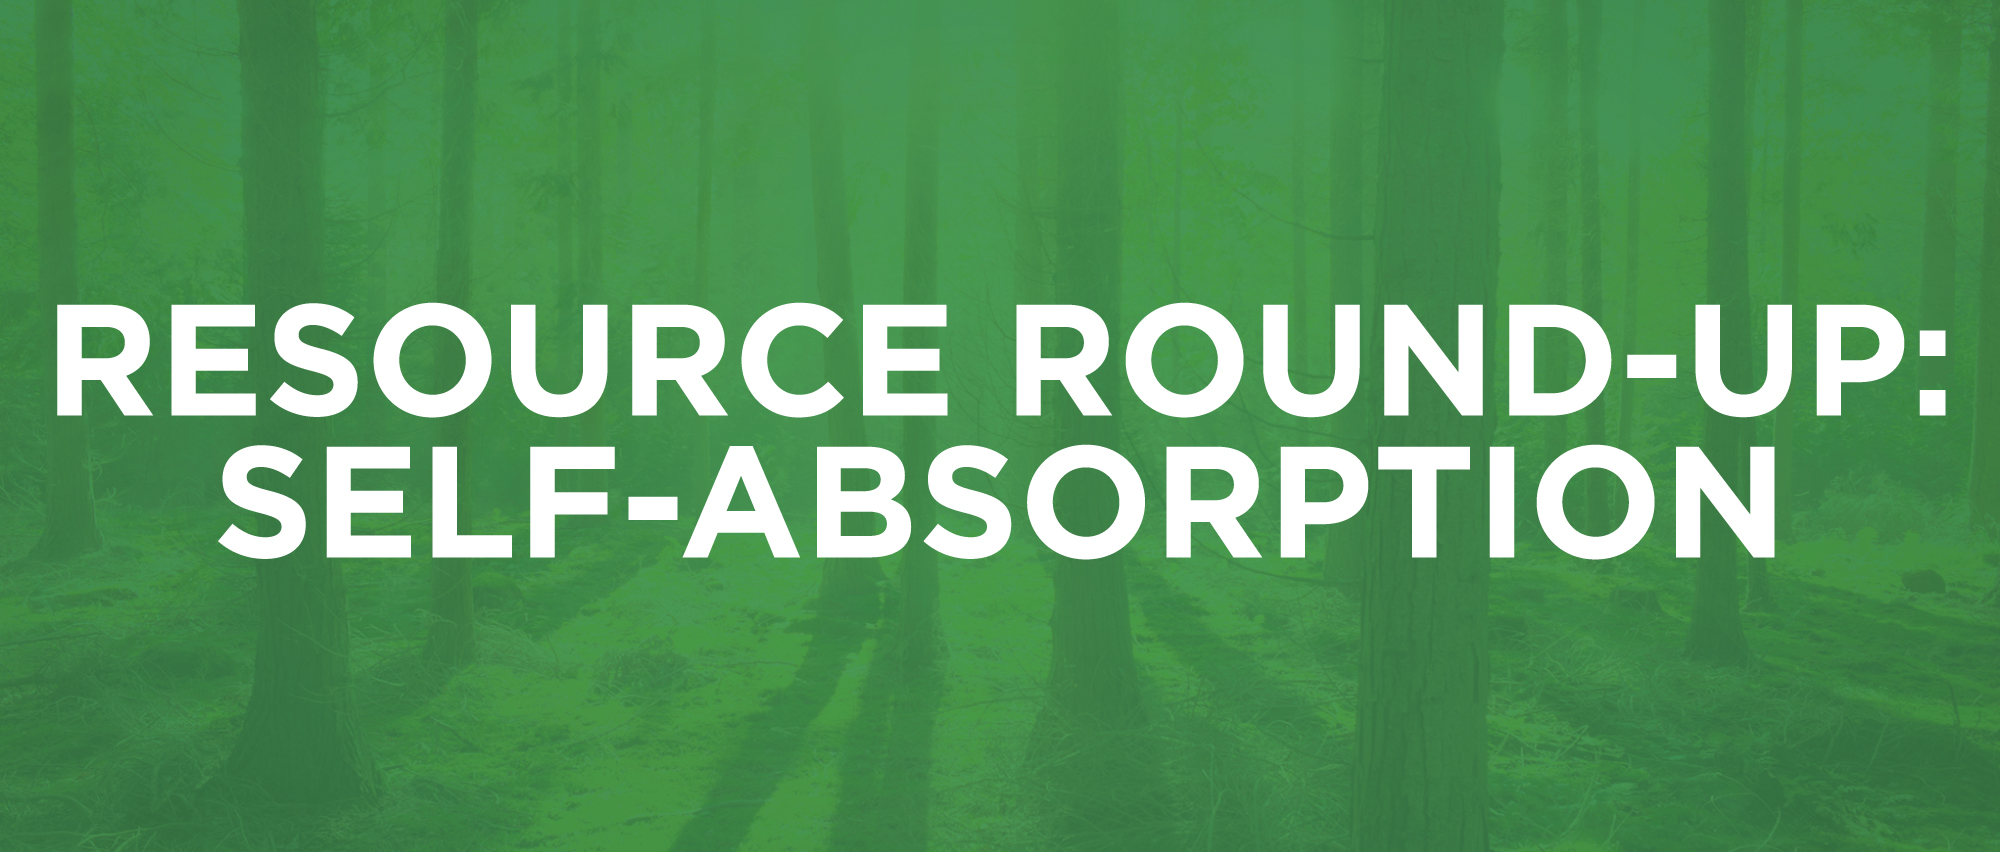 ResourceRoundup-5-SelfAbsorption.jpg